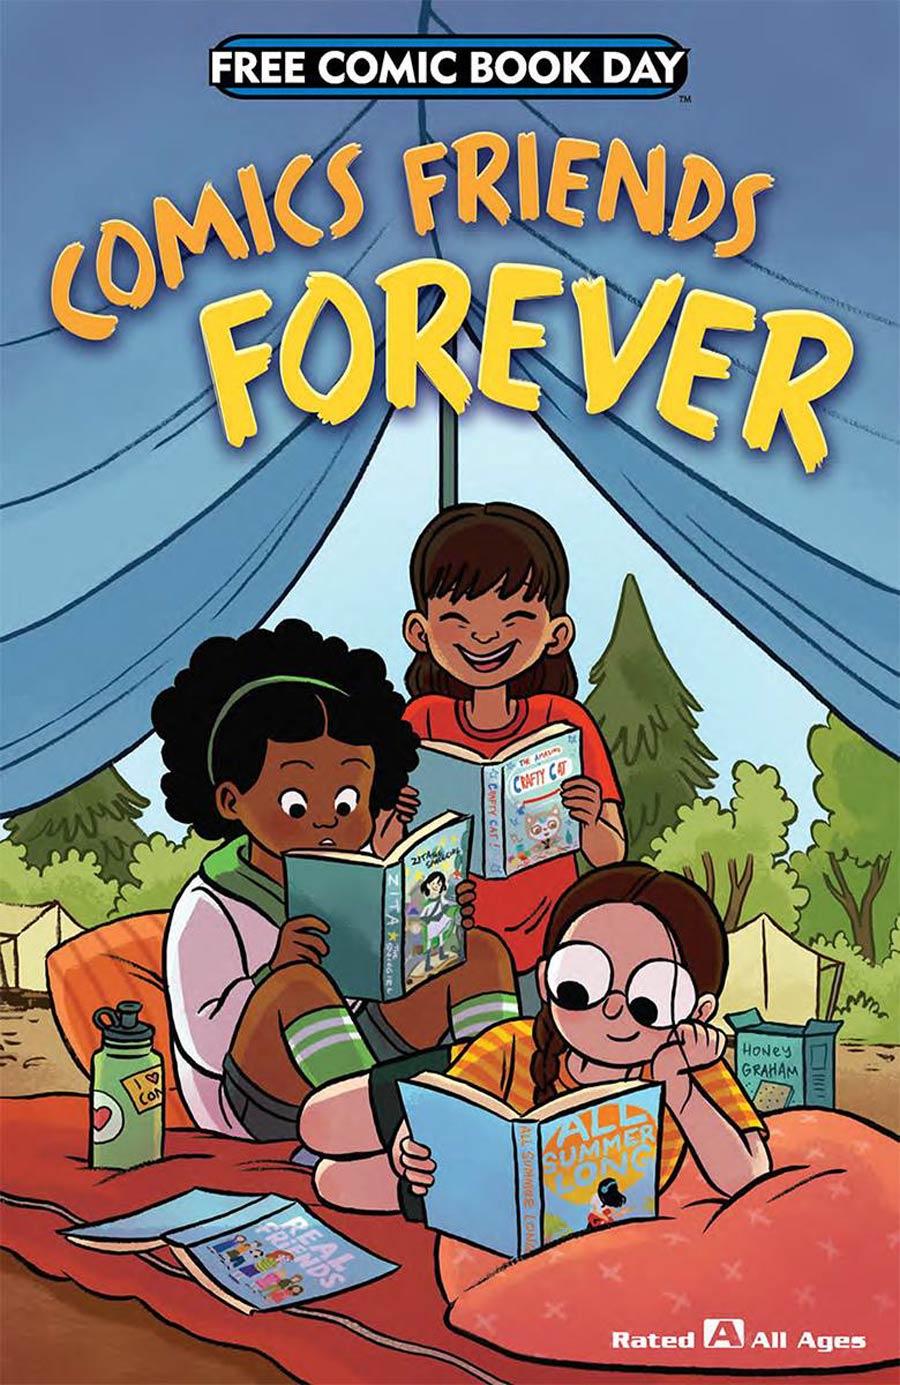 Comics Friends Forever FCBD 2018